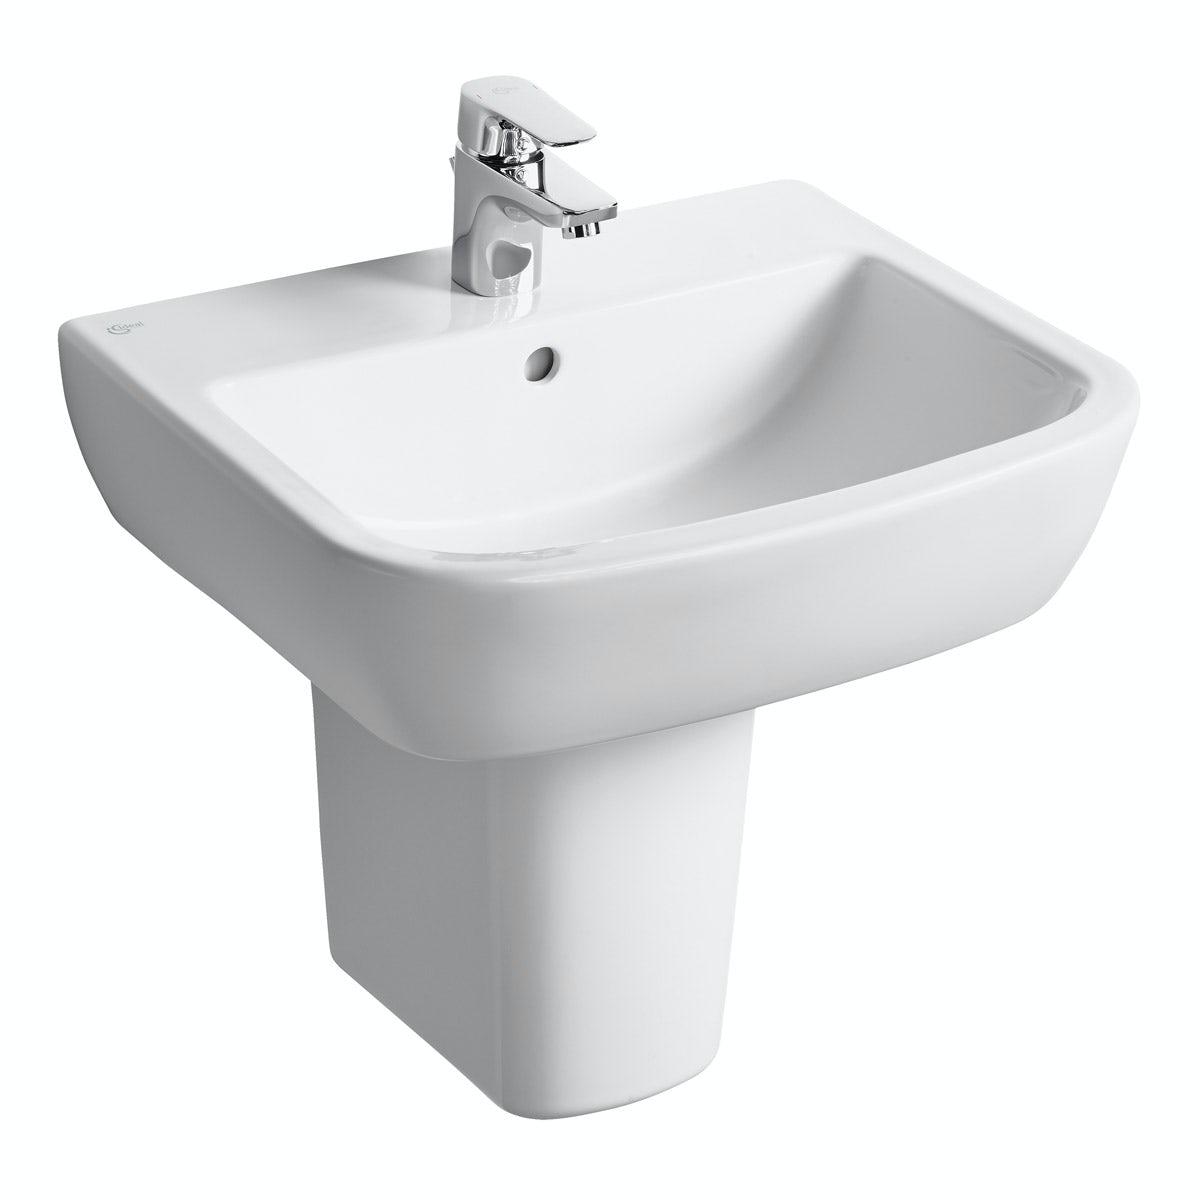 Ideal Standard Tempo 1 tap hole semi pedestal basin 550mm